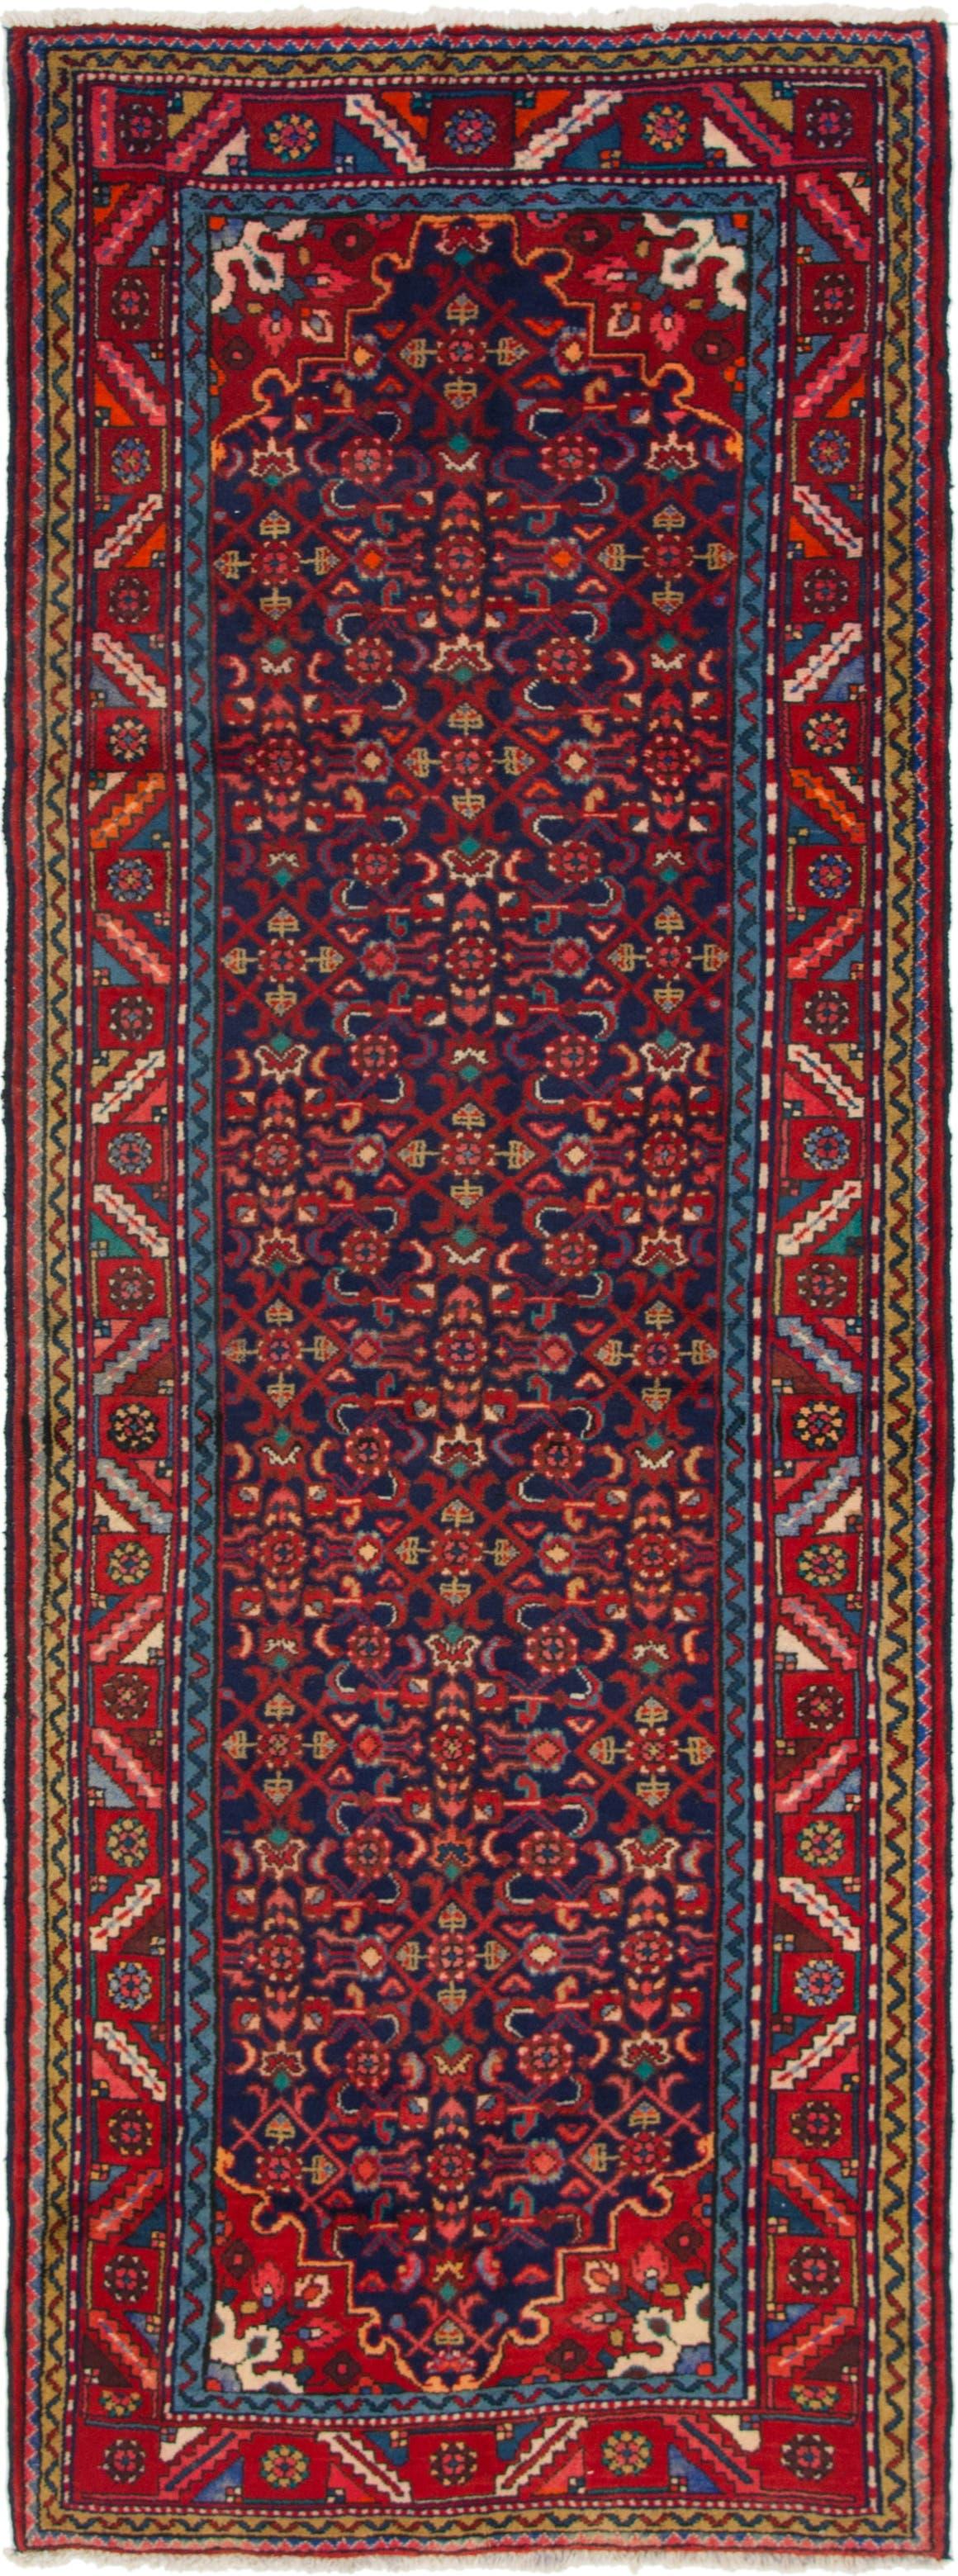 3' 8 x 10' 4 Malayer Persian Runner Rug main image